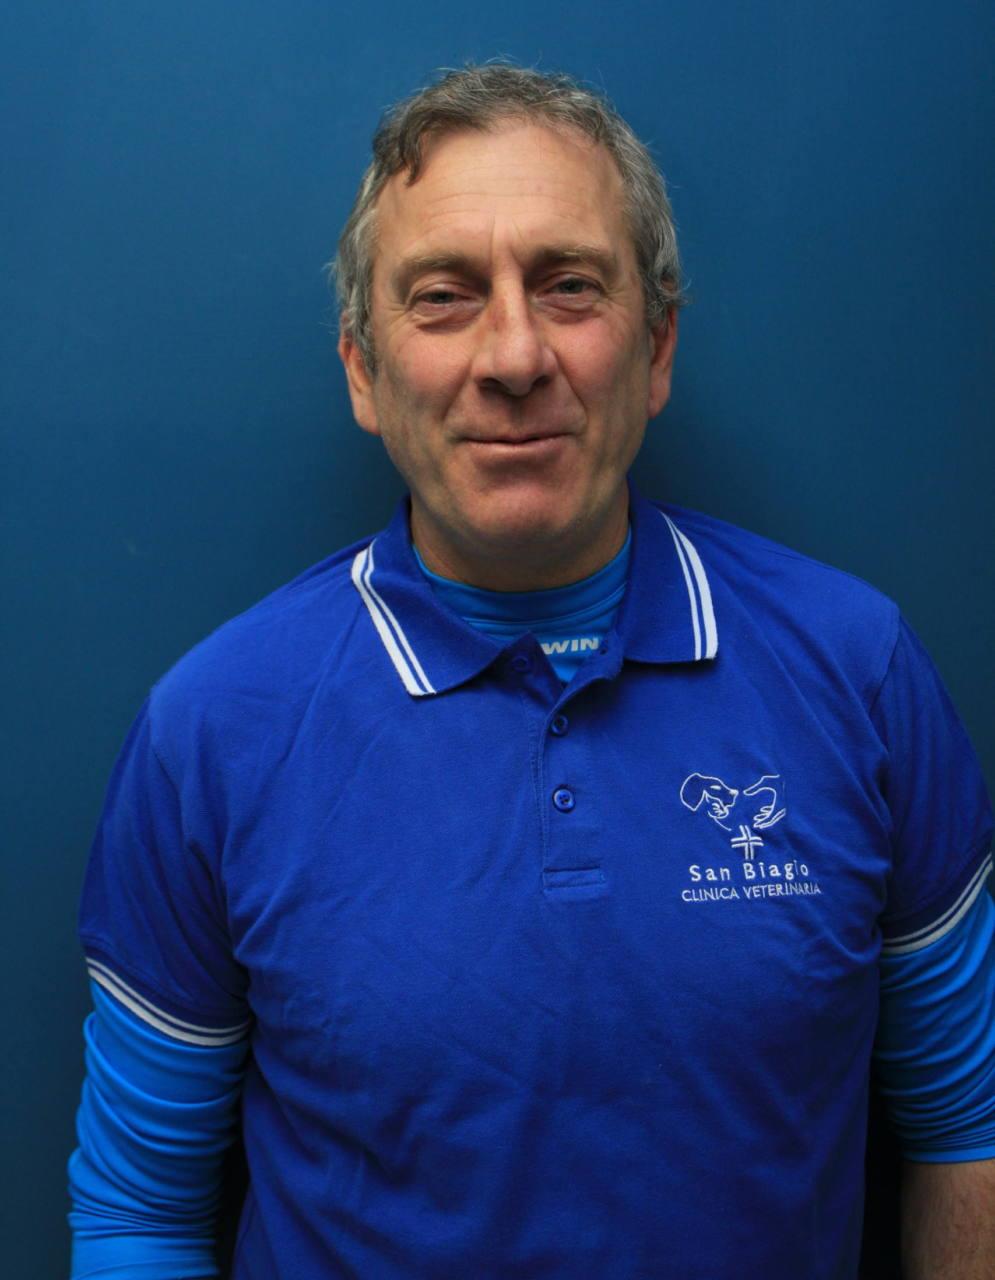 dott. David Blasetti, veterinario